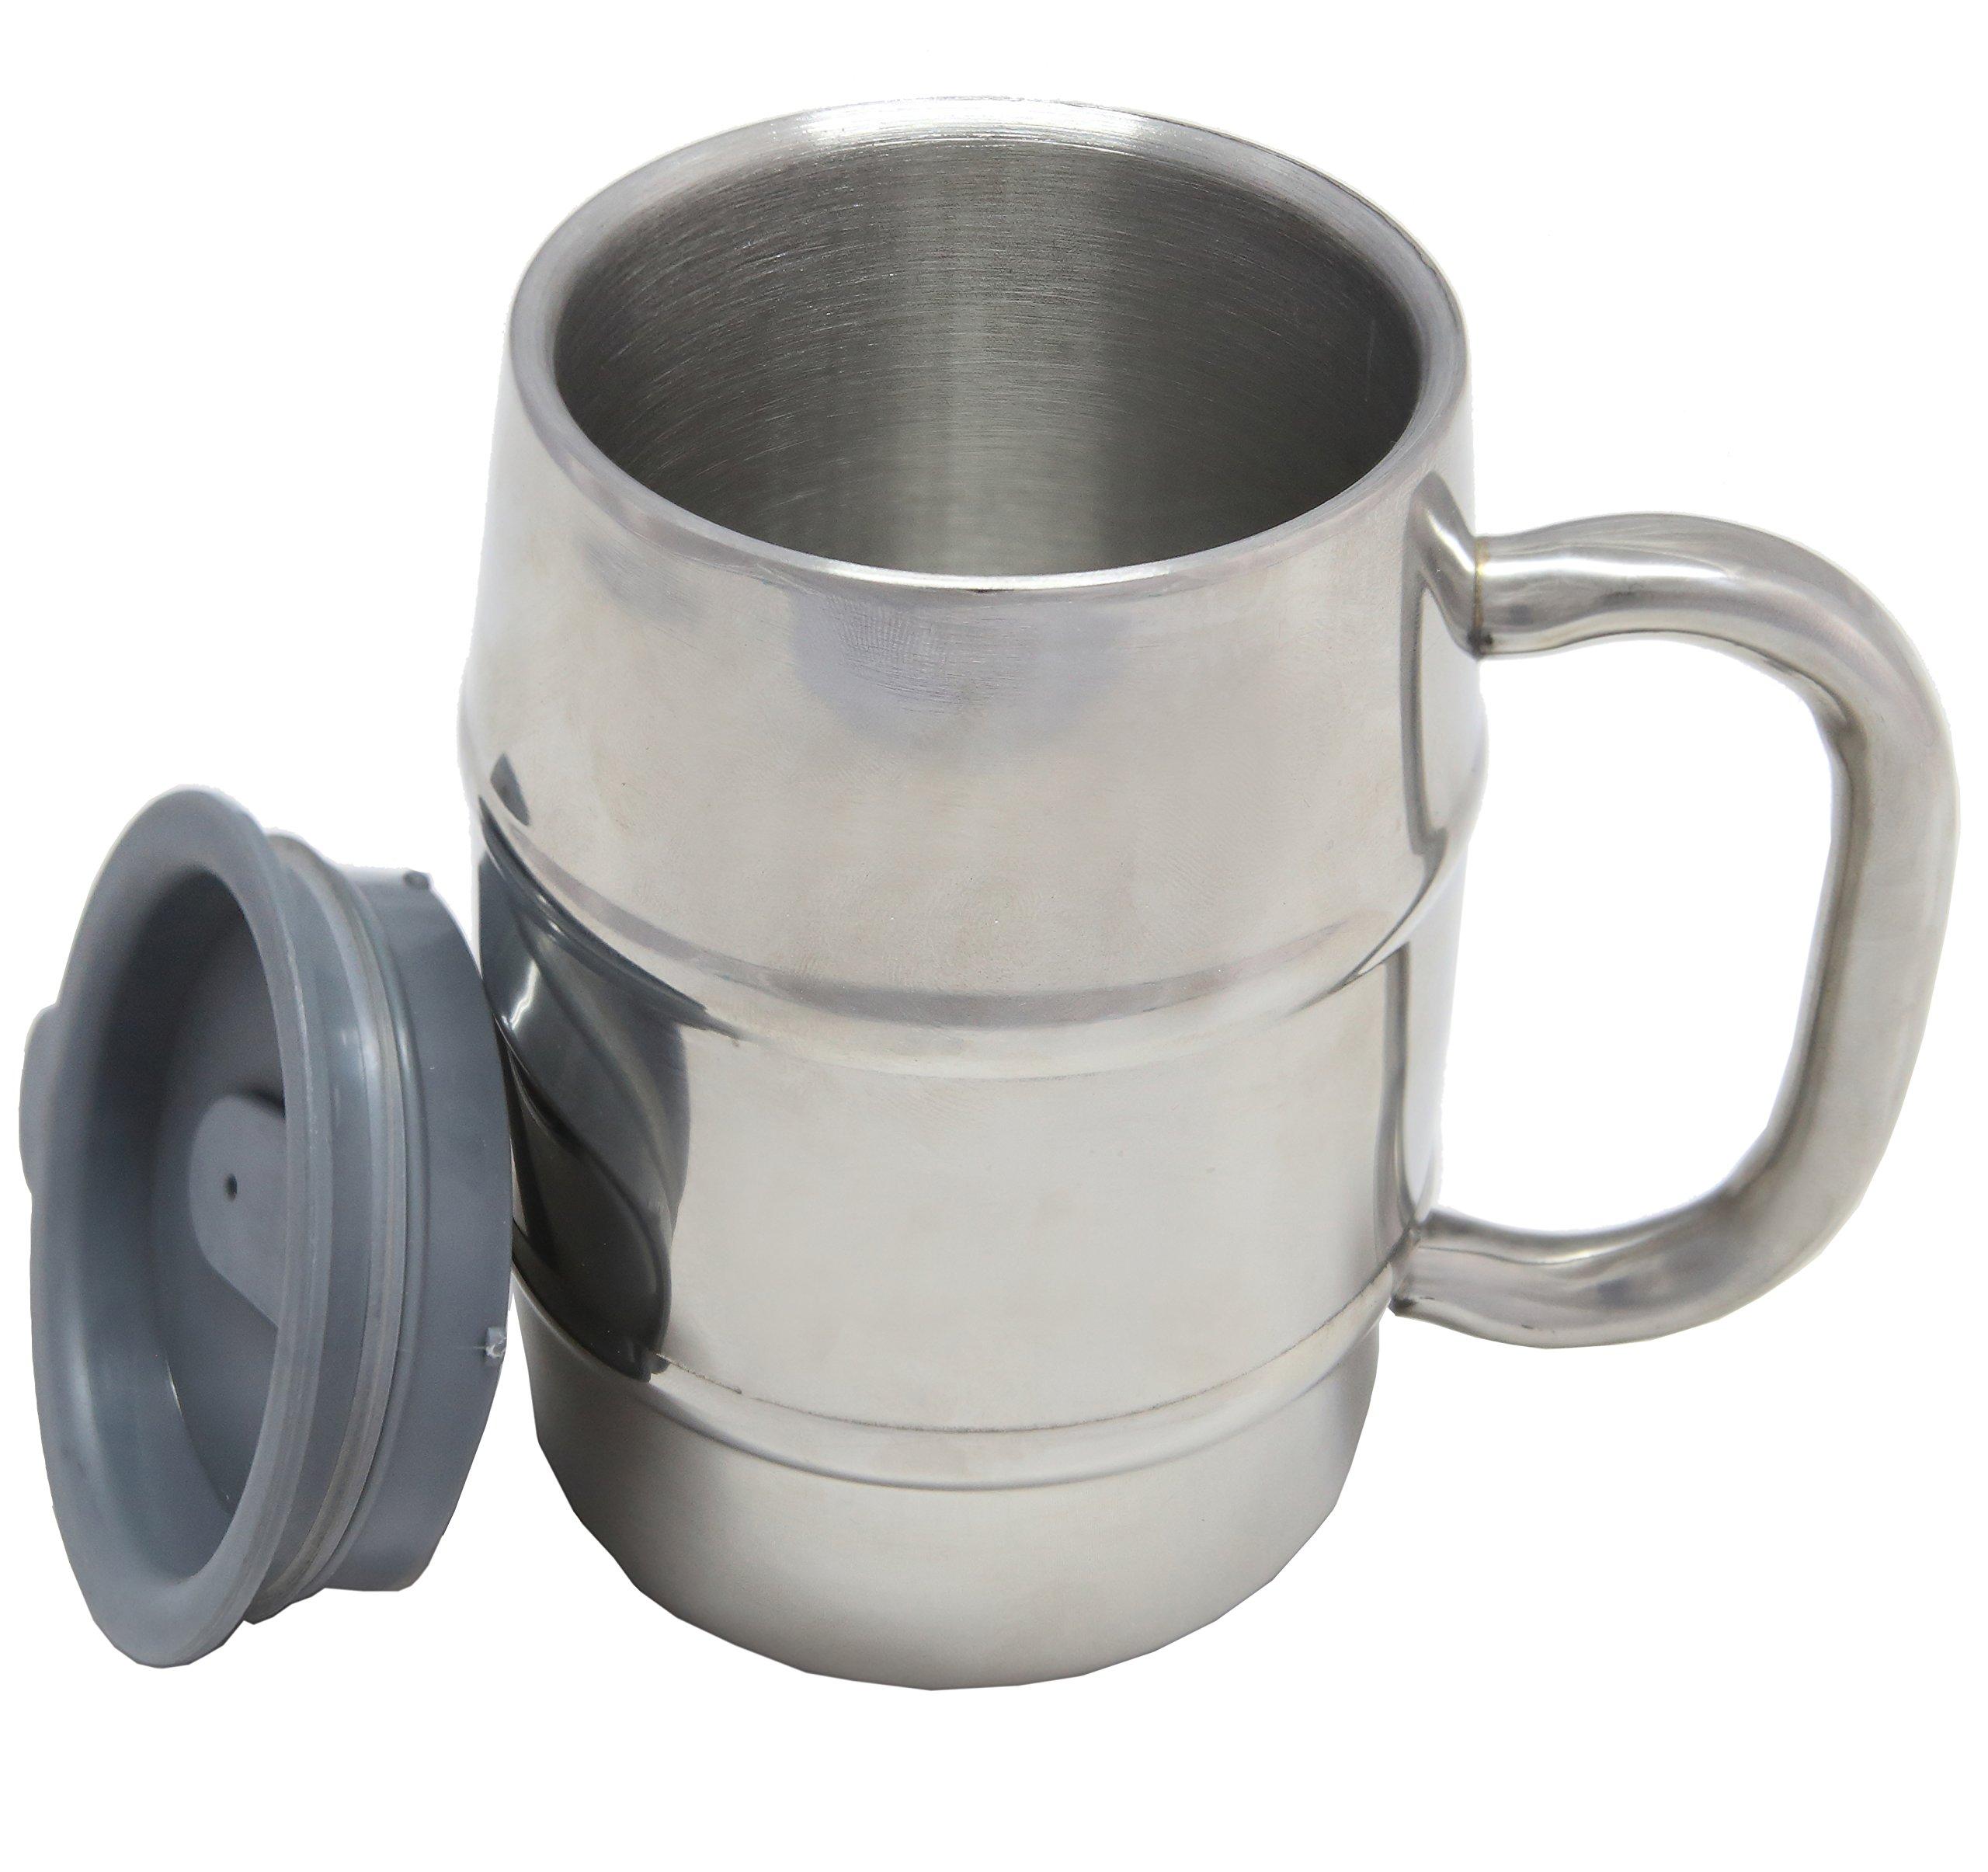 Nuvantee Beer Mug – Premium Stainless Steel Mug/Coffee Cup with Bonus Lid, Silver